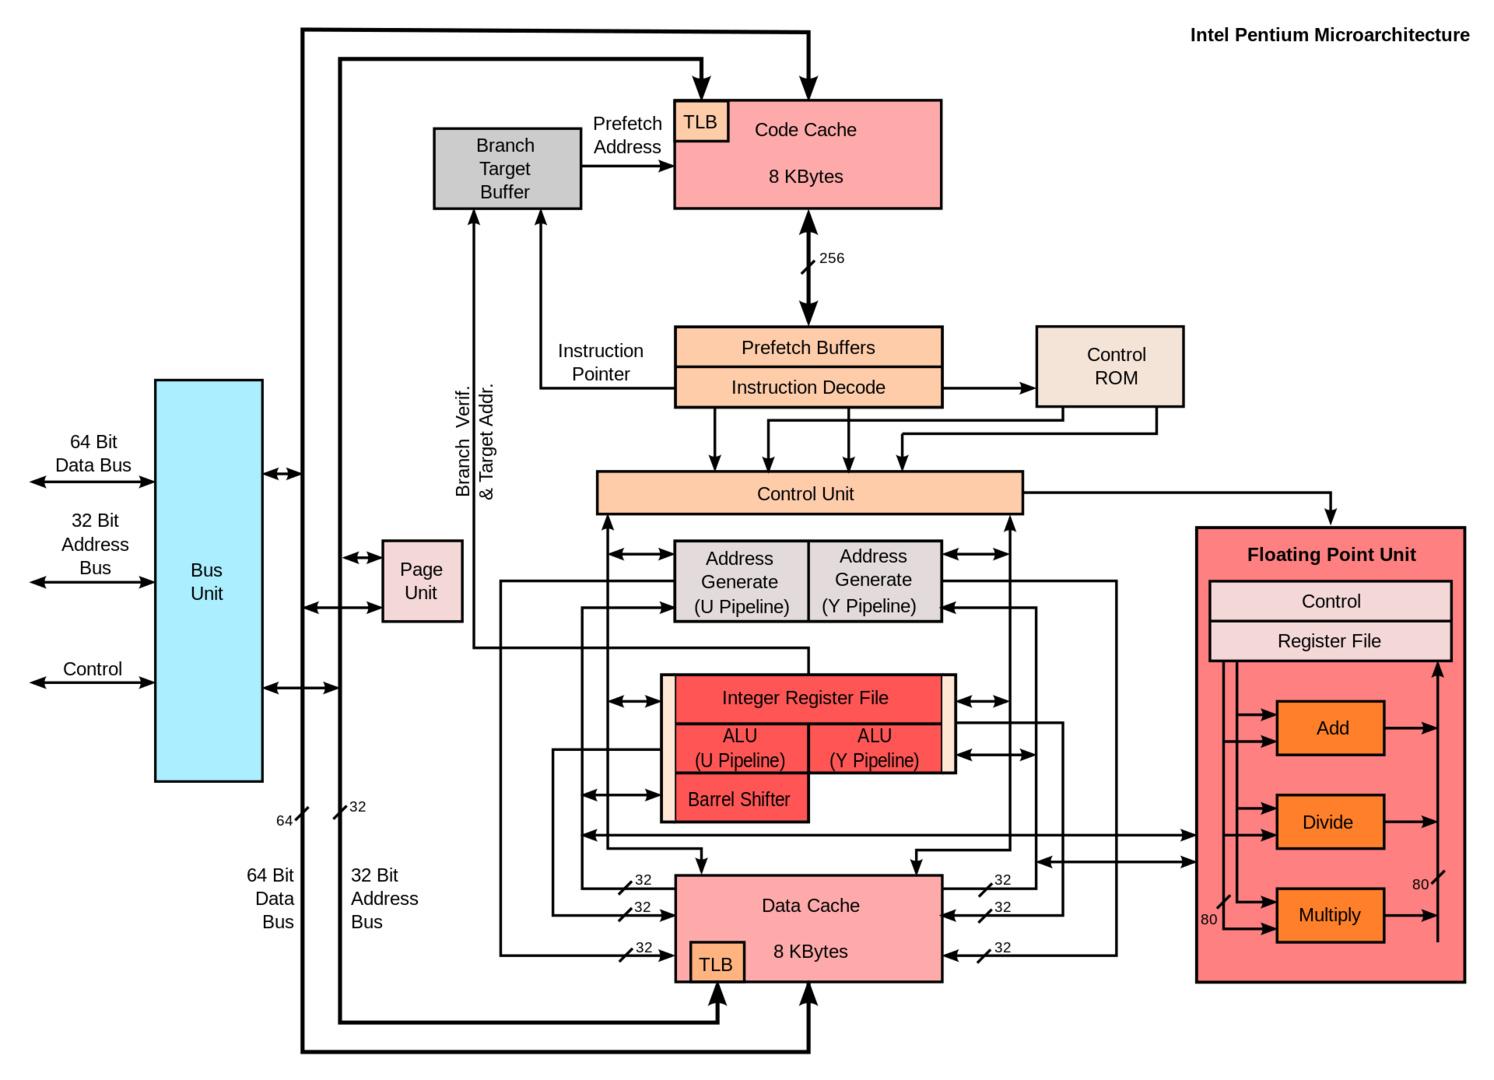 Die Architektur des Intel Pentium